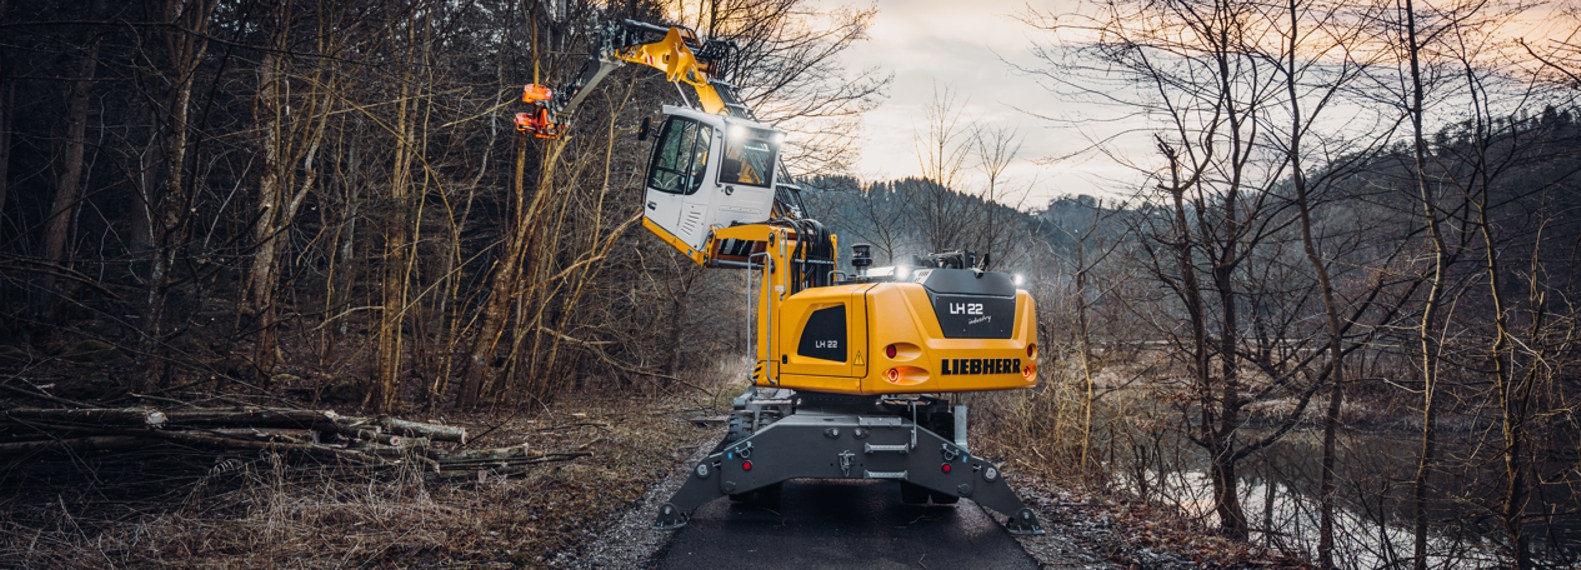 Caterpillar Bulldozer Dozer Yellow Machine Parked Editorial Image - Image  of build, mover: 104886845